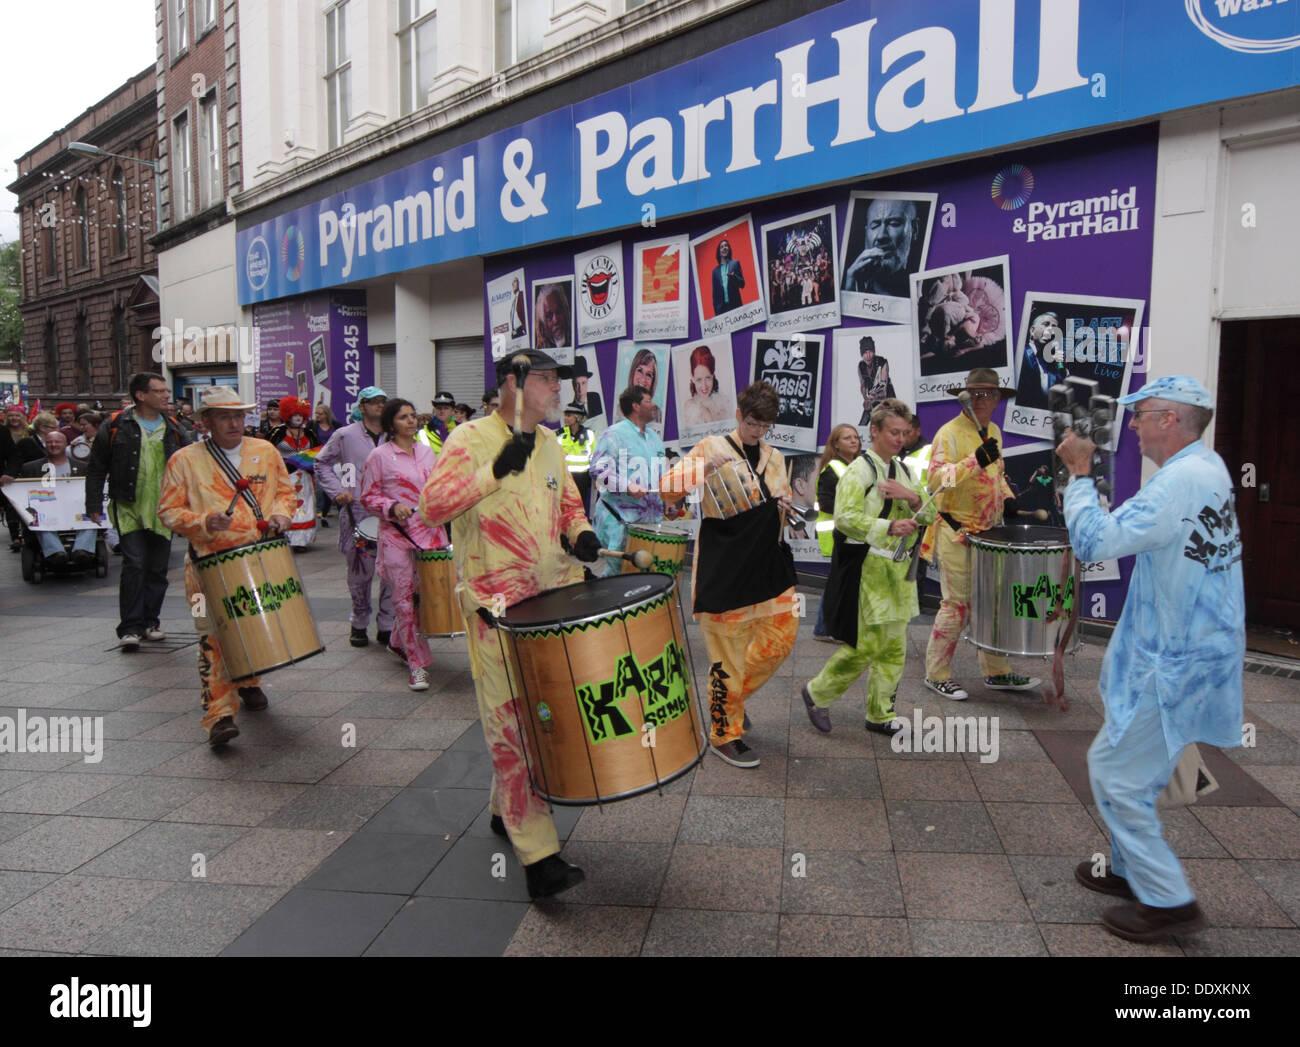 Laden Sie dieses Alamy Stockfoto Karamba Samba führt Warrington stolz September 2013 in Sankey St, Cheshire England UK WA1 - DDXKNX